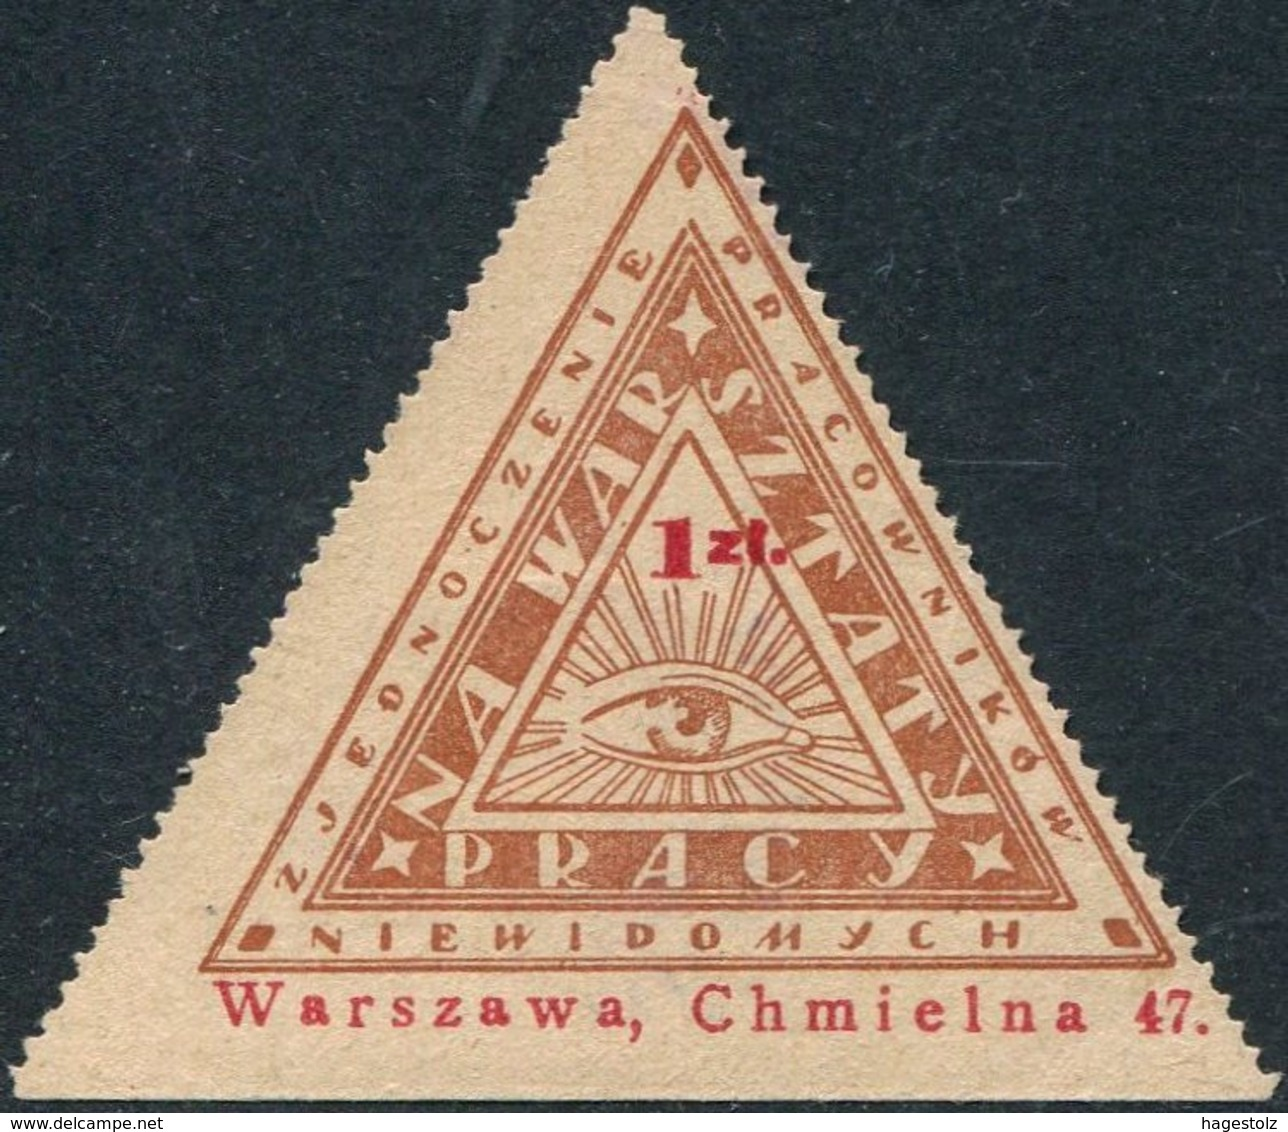 Poland Eye Of Providence 1 Zl. For The Blind Charity Donation Revenue Masonic Symbol All-seeing Eye Of God Polen Pologne - Freemasonry